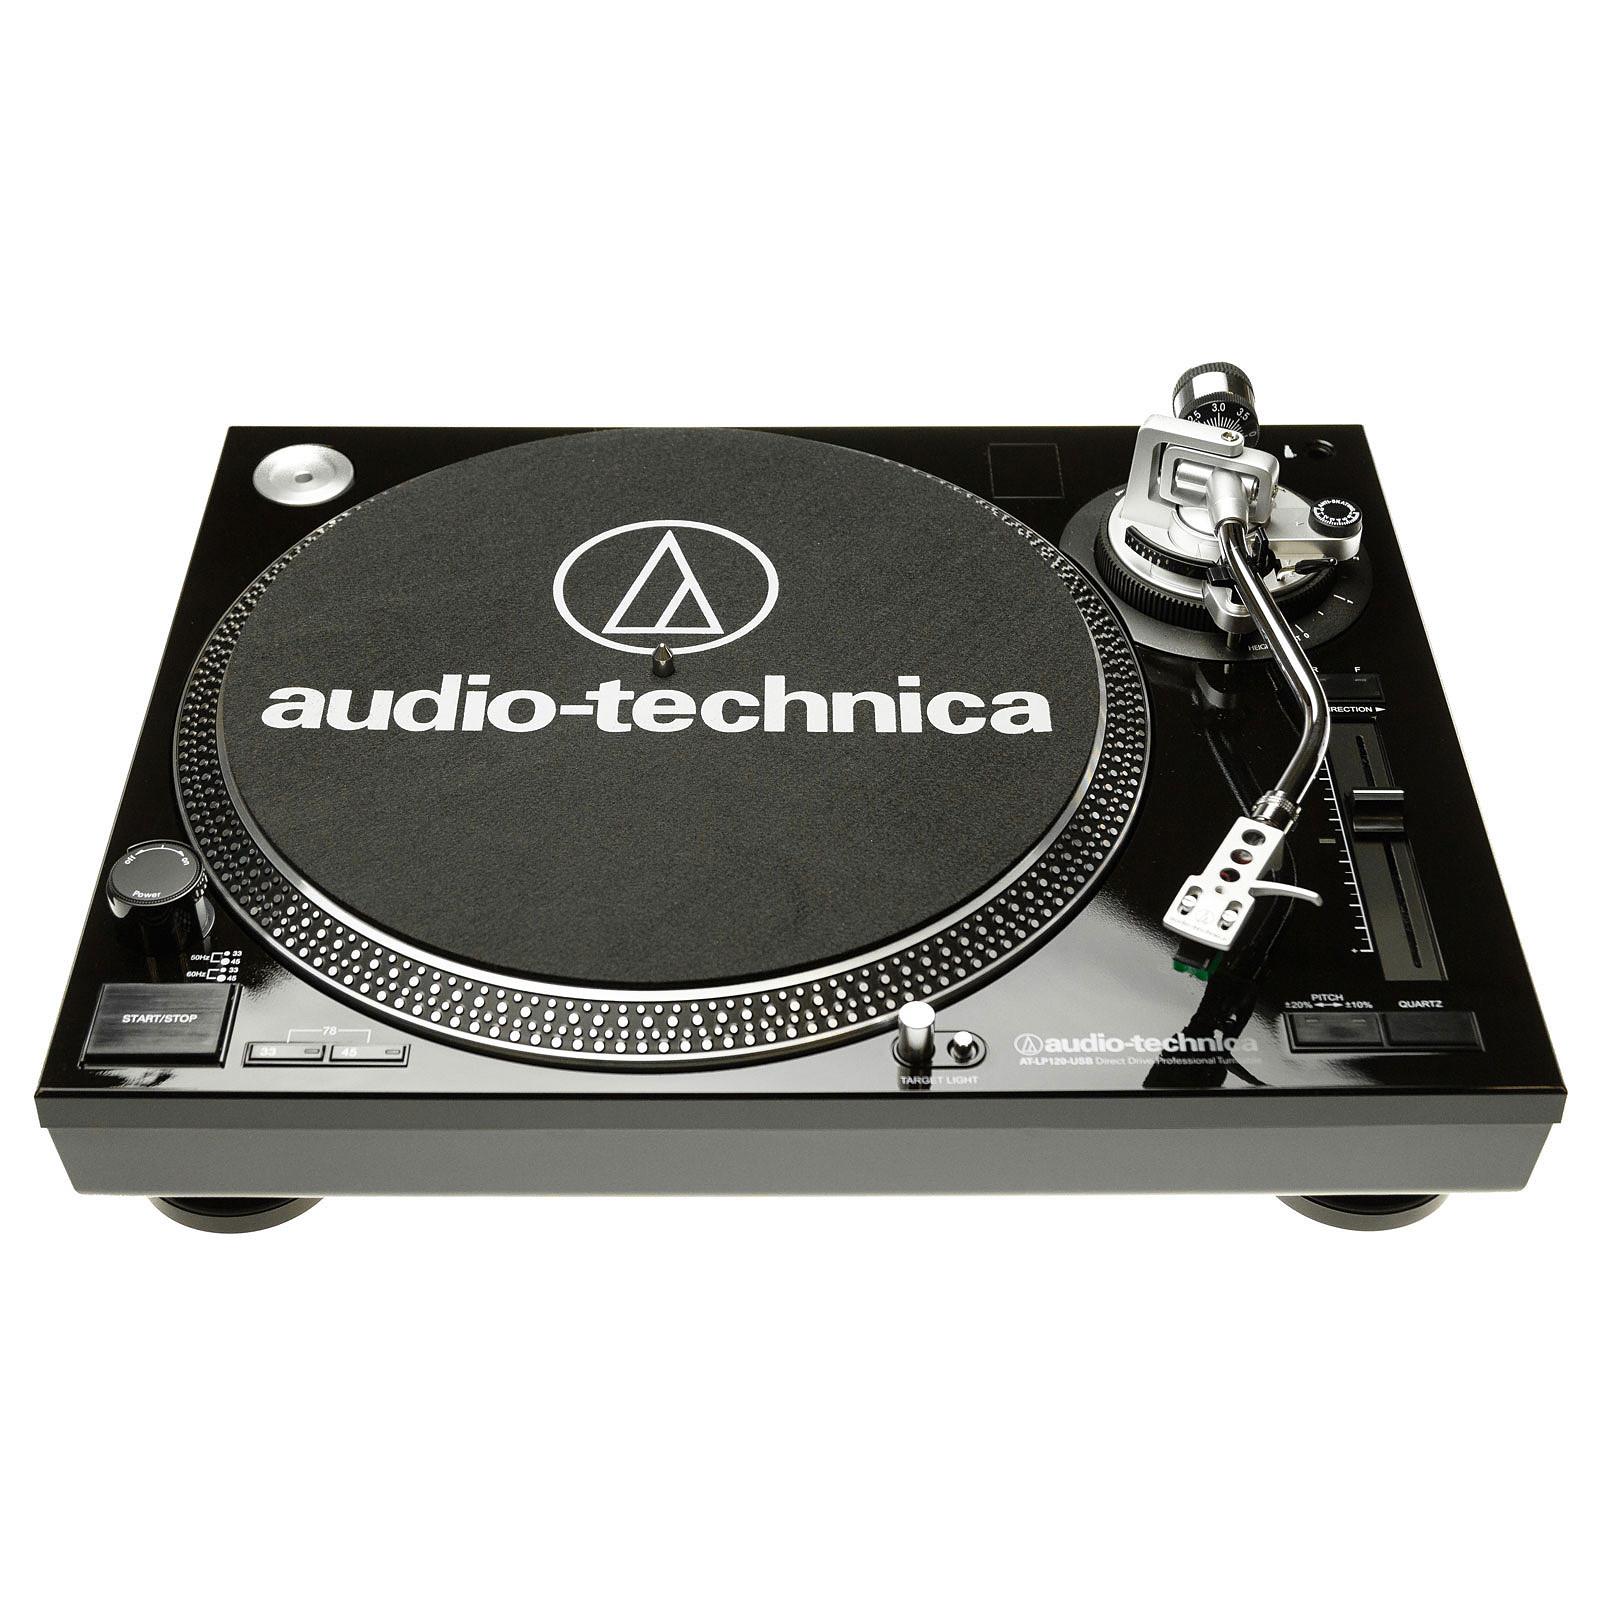 Audio-Technica AT-LP120USBC Noir